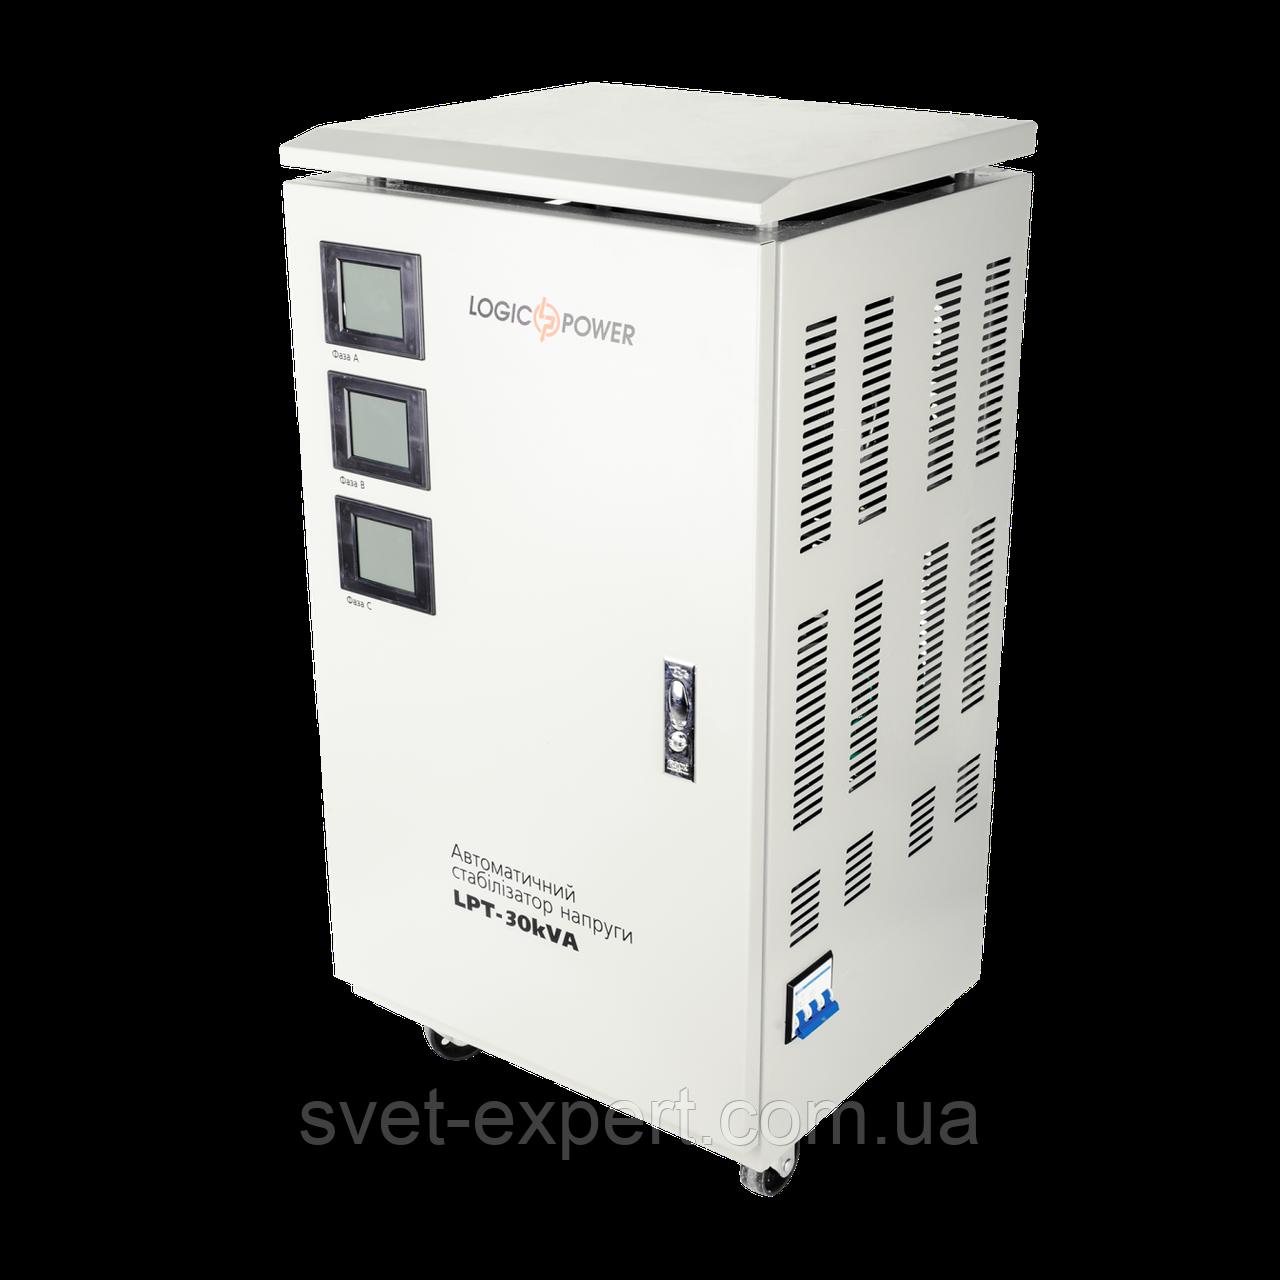 Стабилизатор напряжения LPT-30kVA 3 phase (21000Вт)